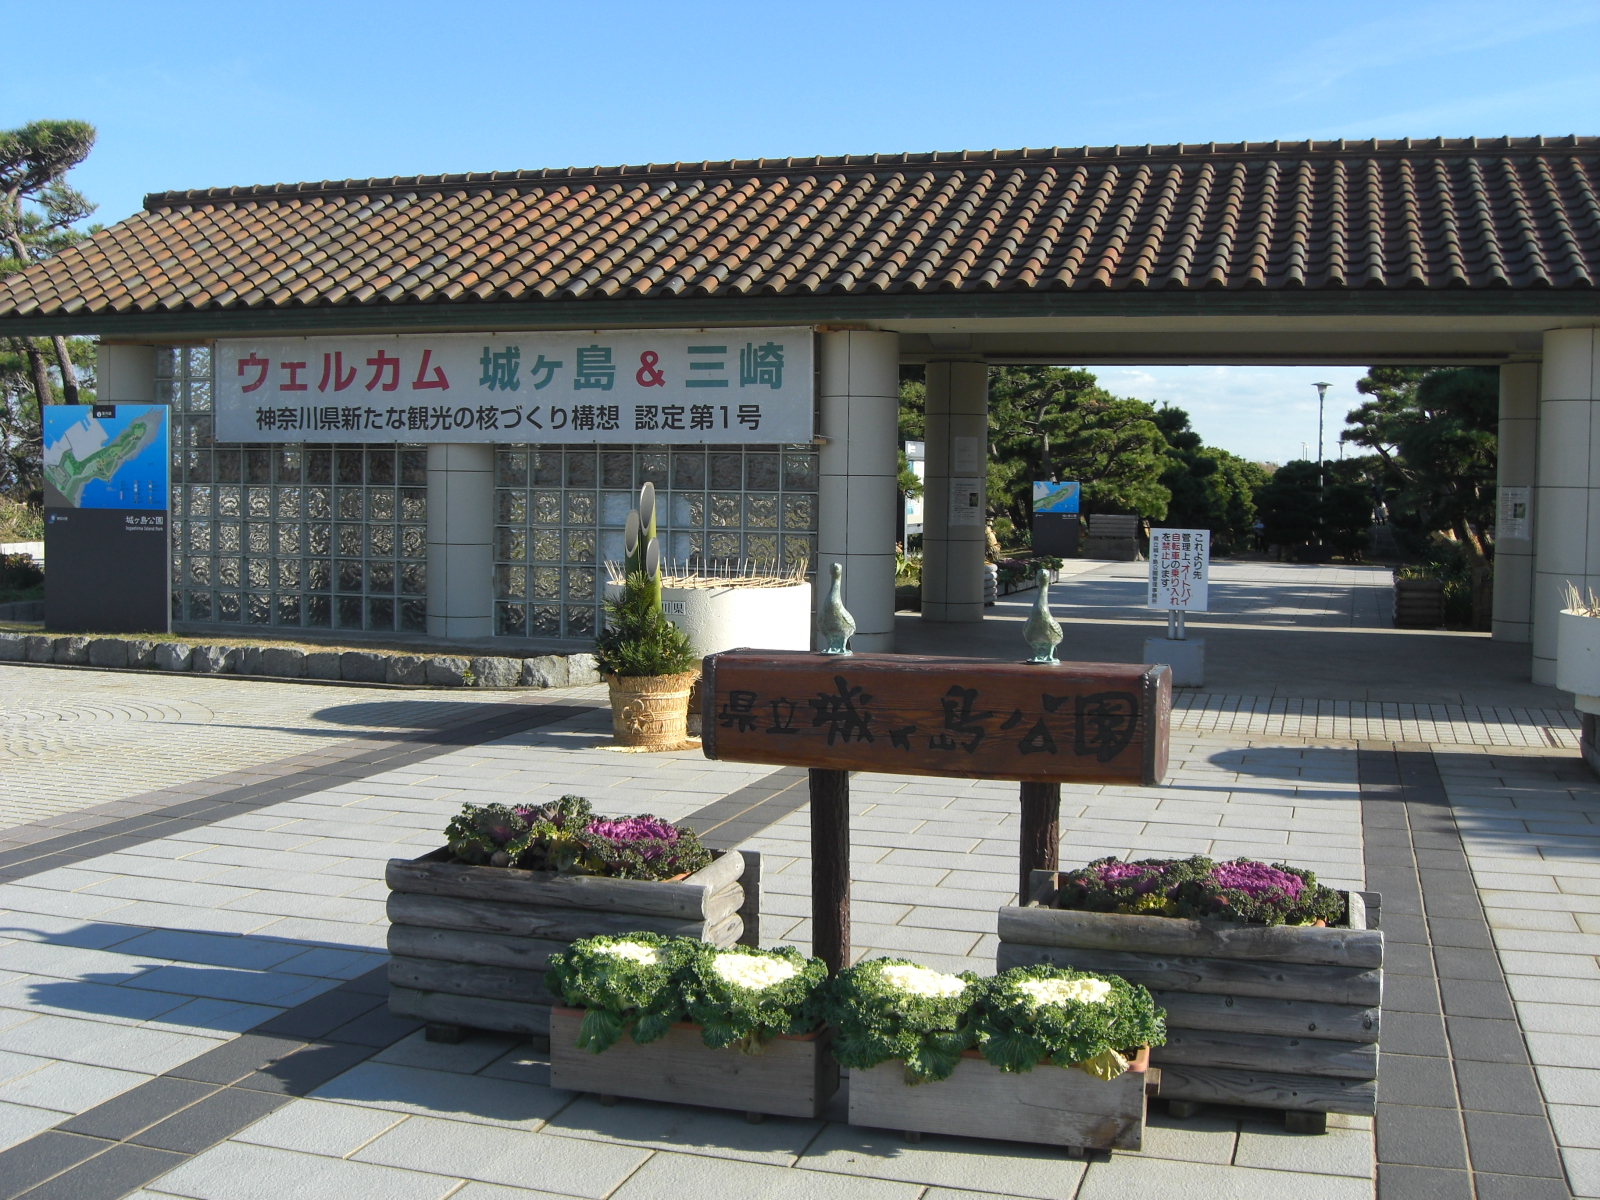 神奈川県立城ヶ島公園2